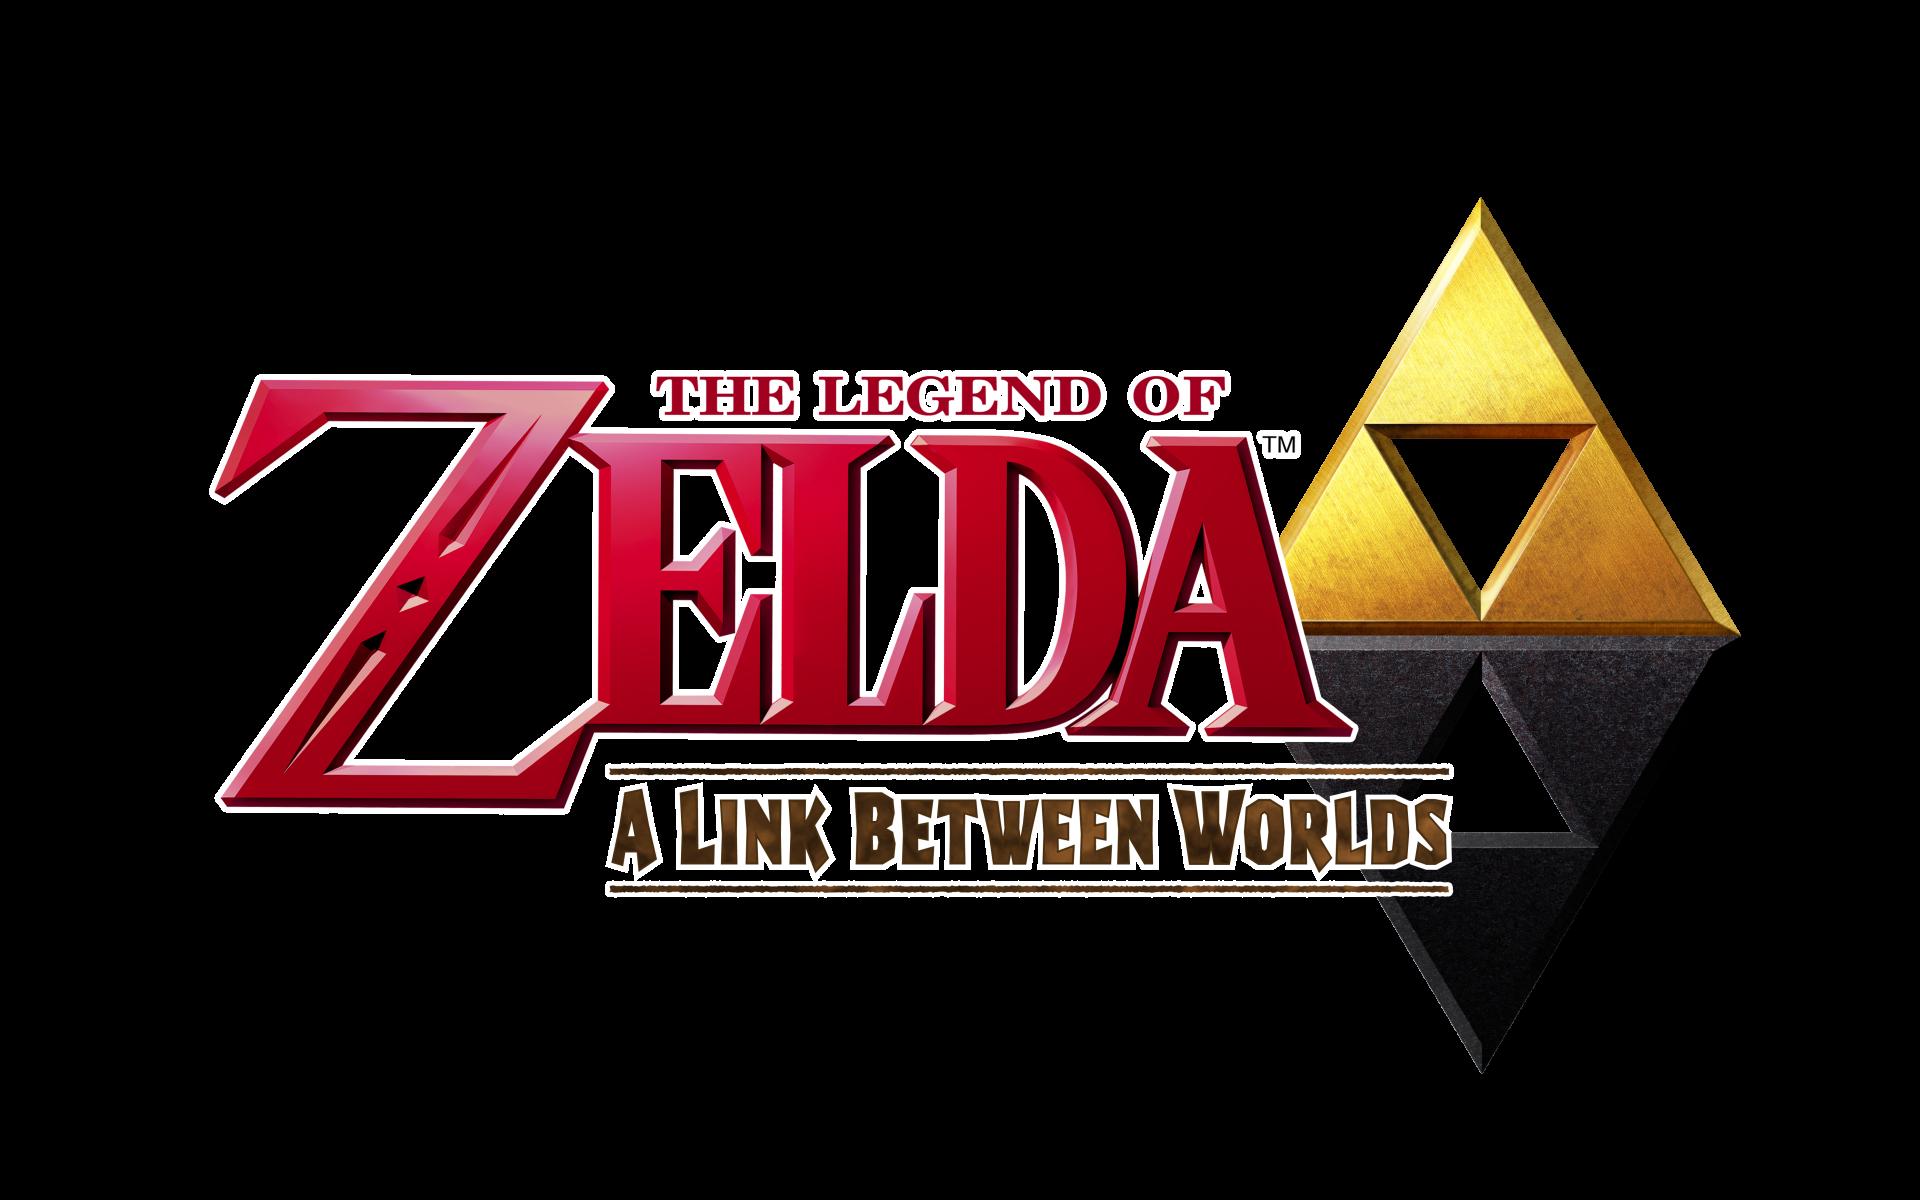 The Legend of Zelda: A Link Between Worlds wins big at GDC